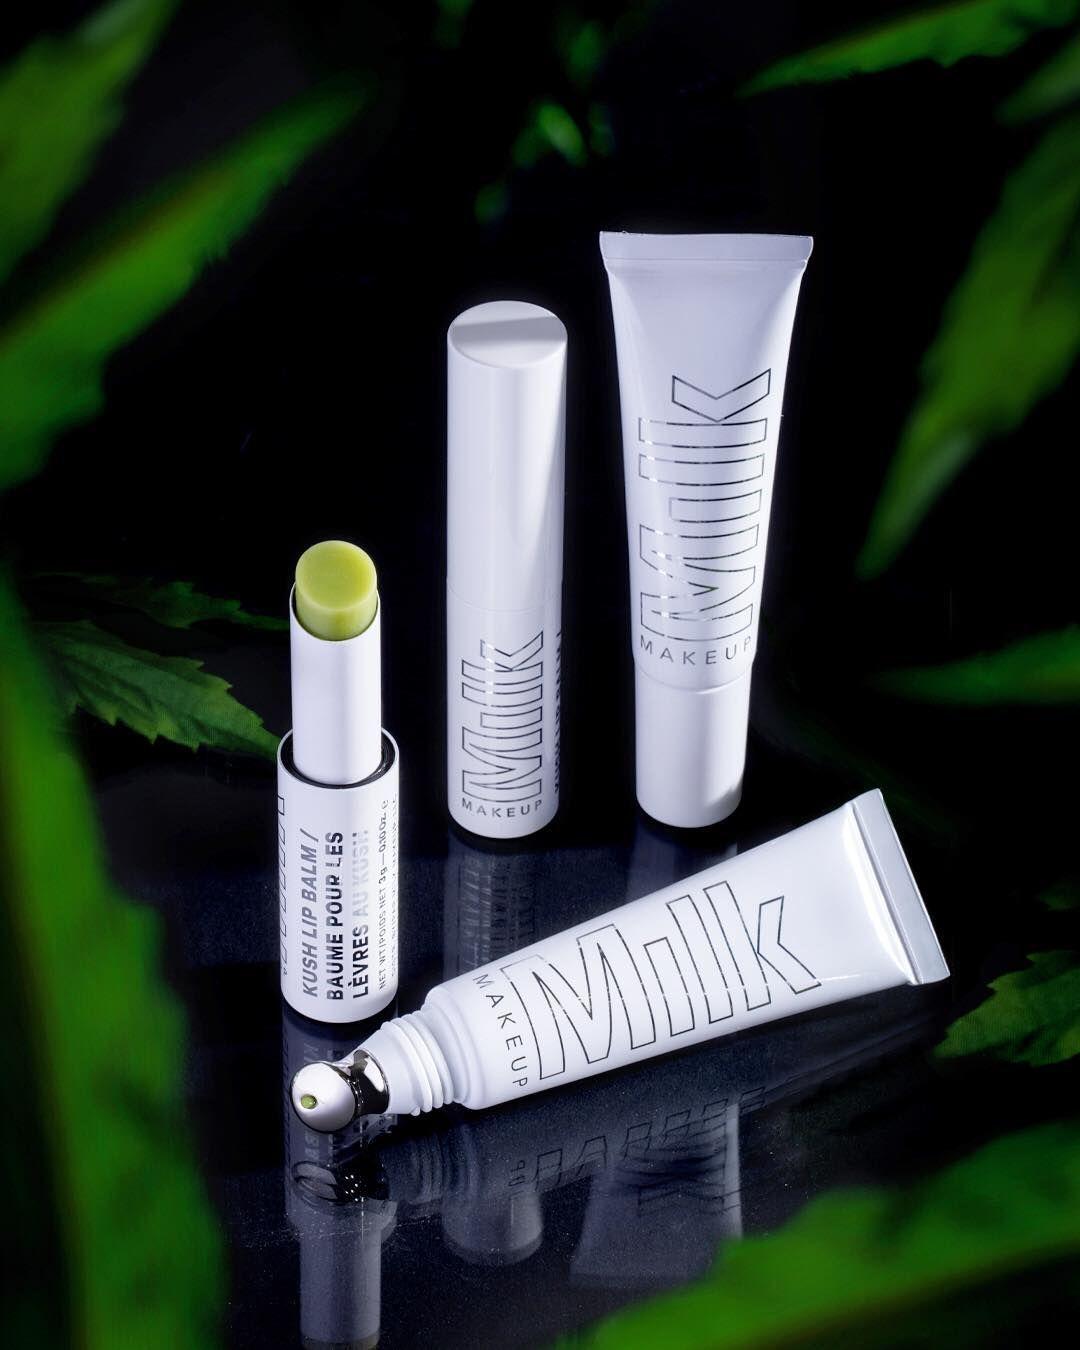 Lip Balm Packaging Beauty Makeup เครื่องสำอาง, ความงาม